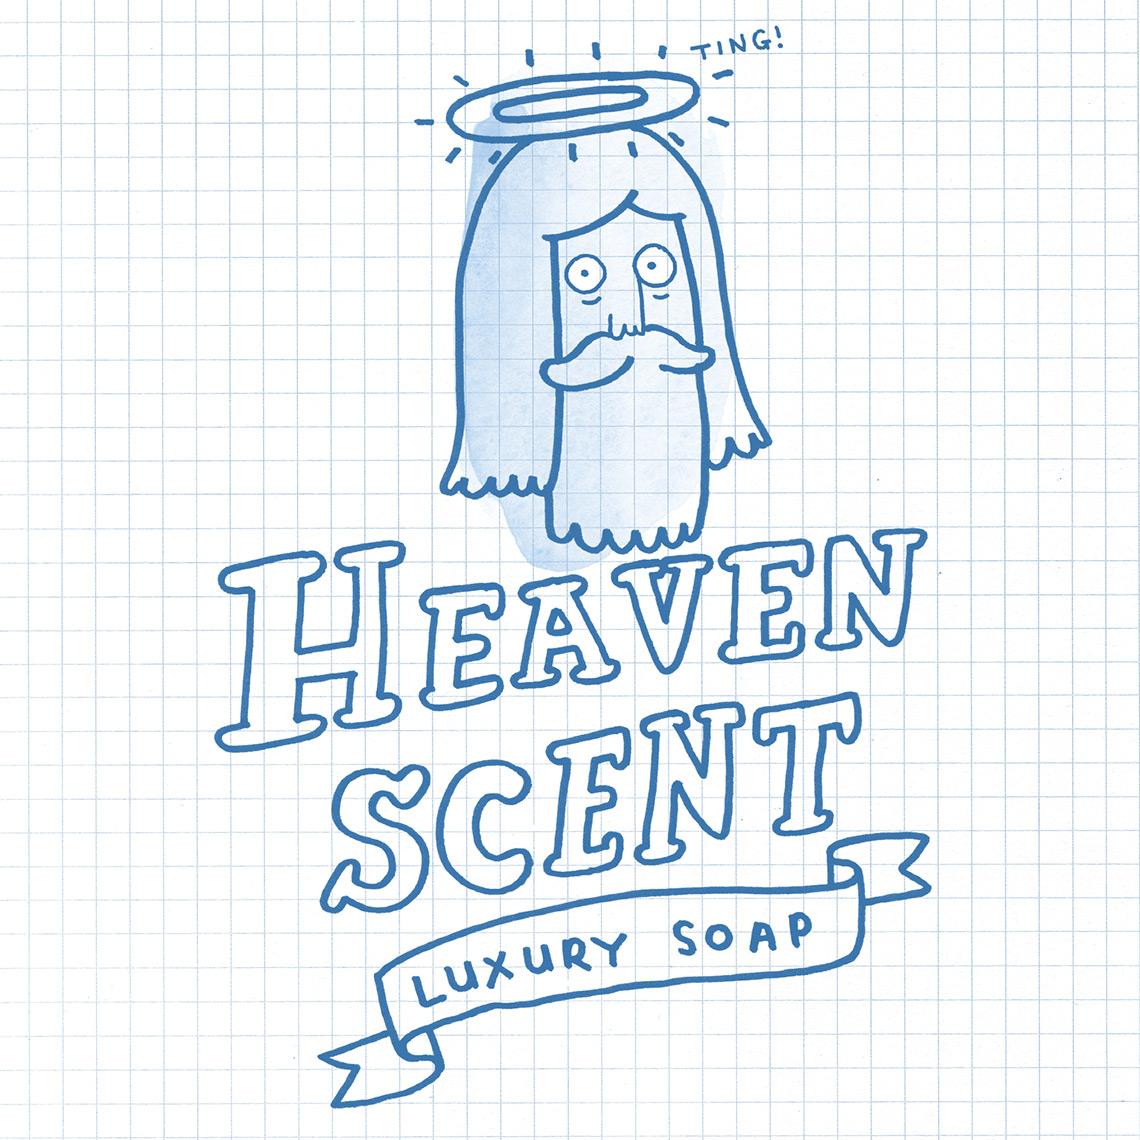 Sketch_Heaven.jpg